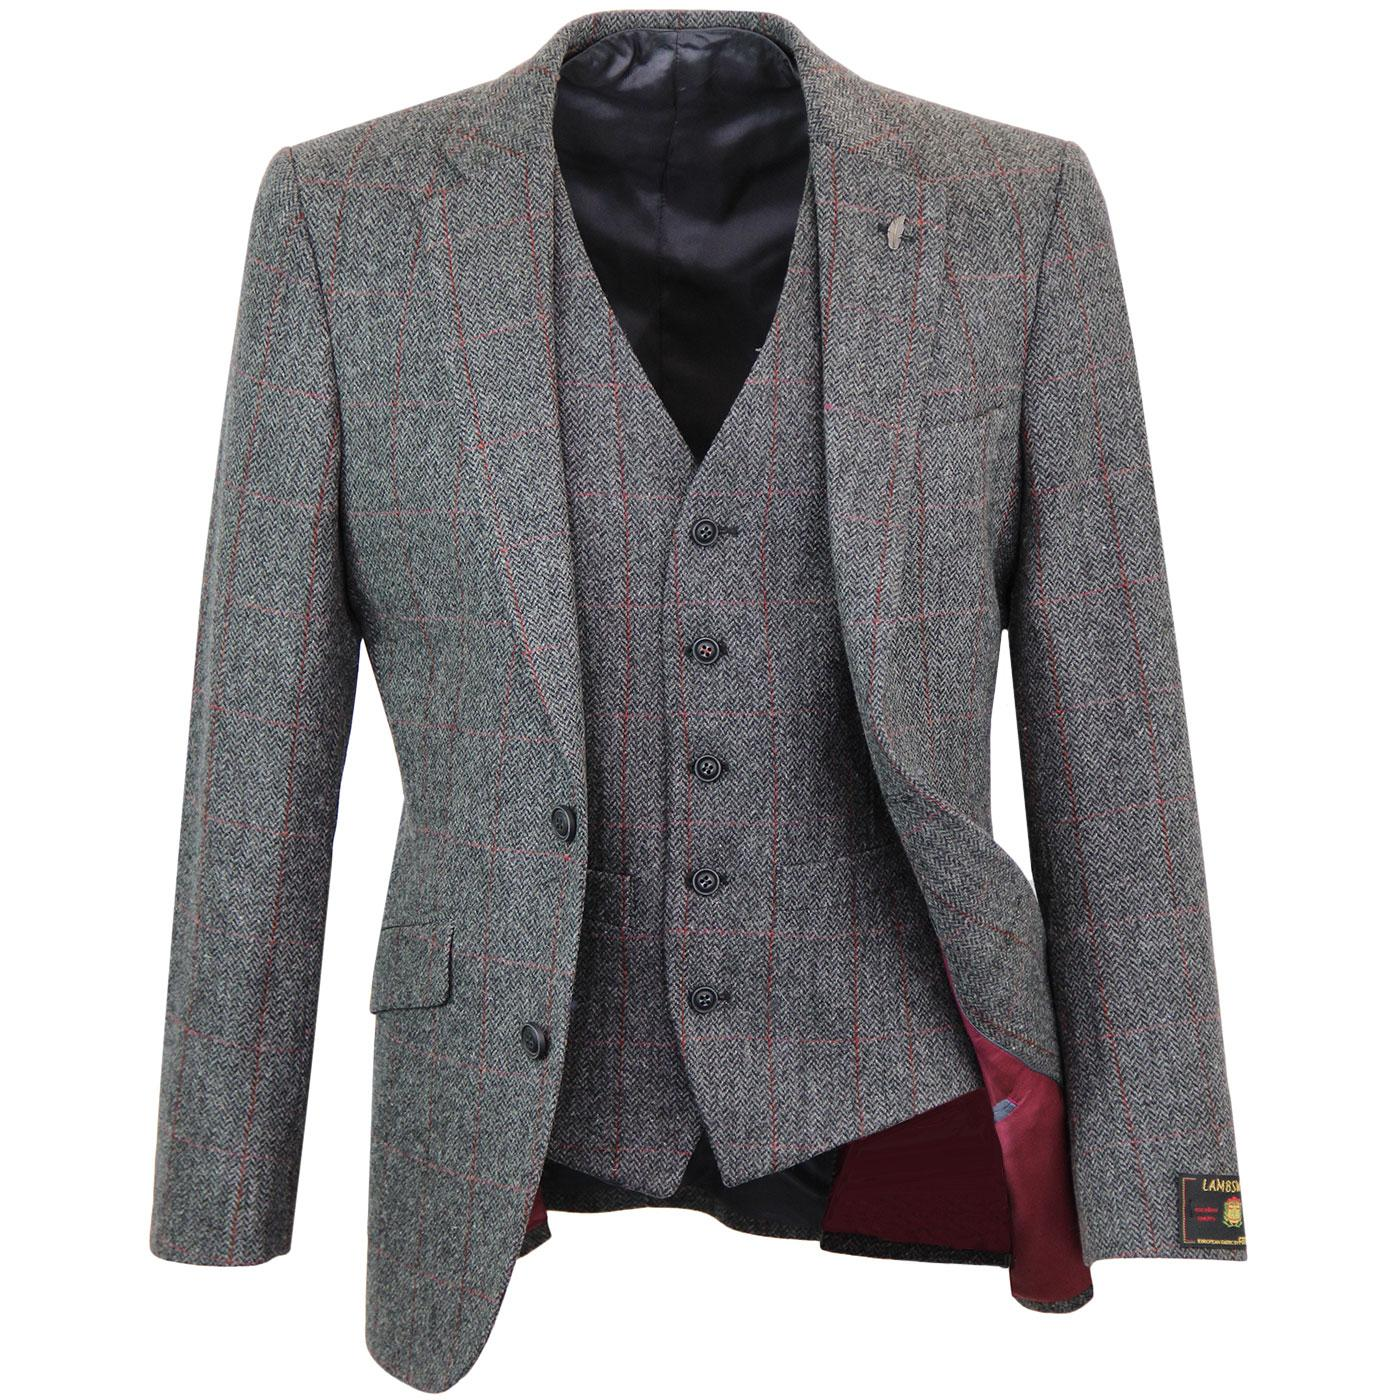 Mod Herringbone Windowpane Blazer & Waistcoat